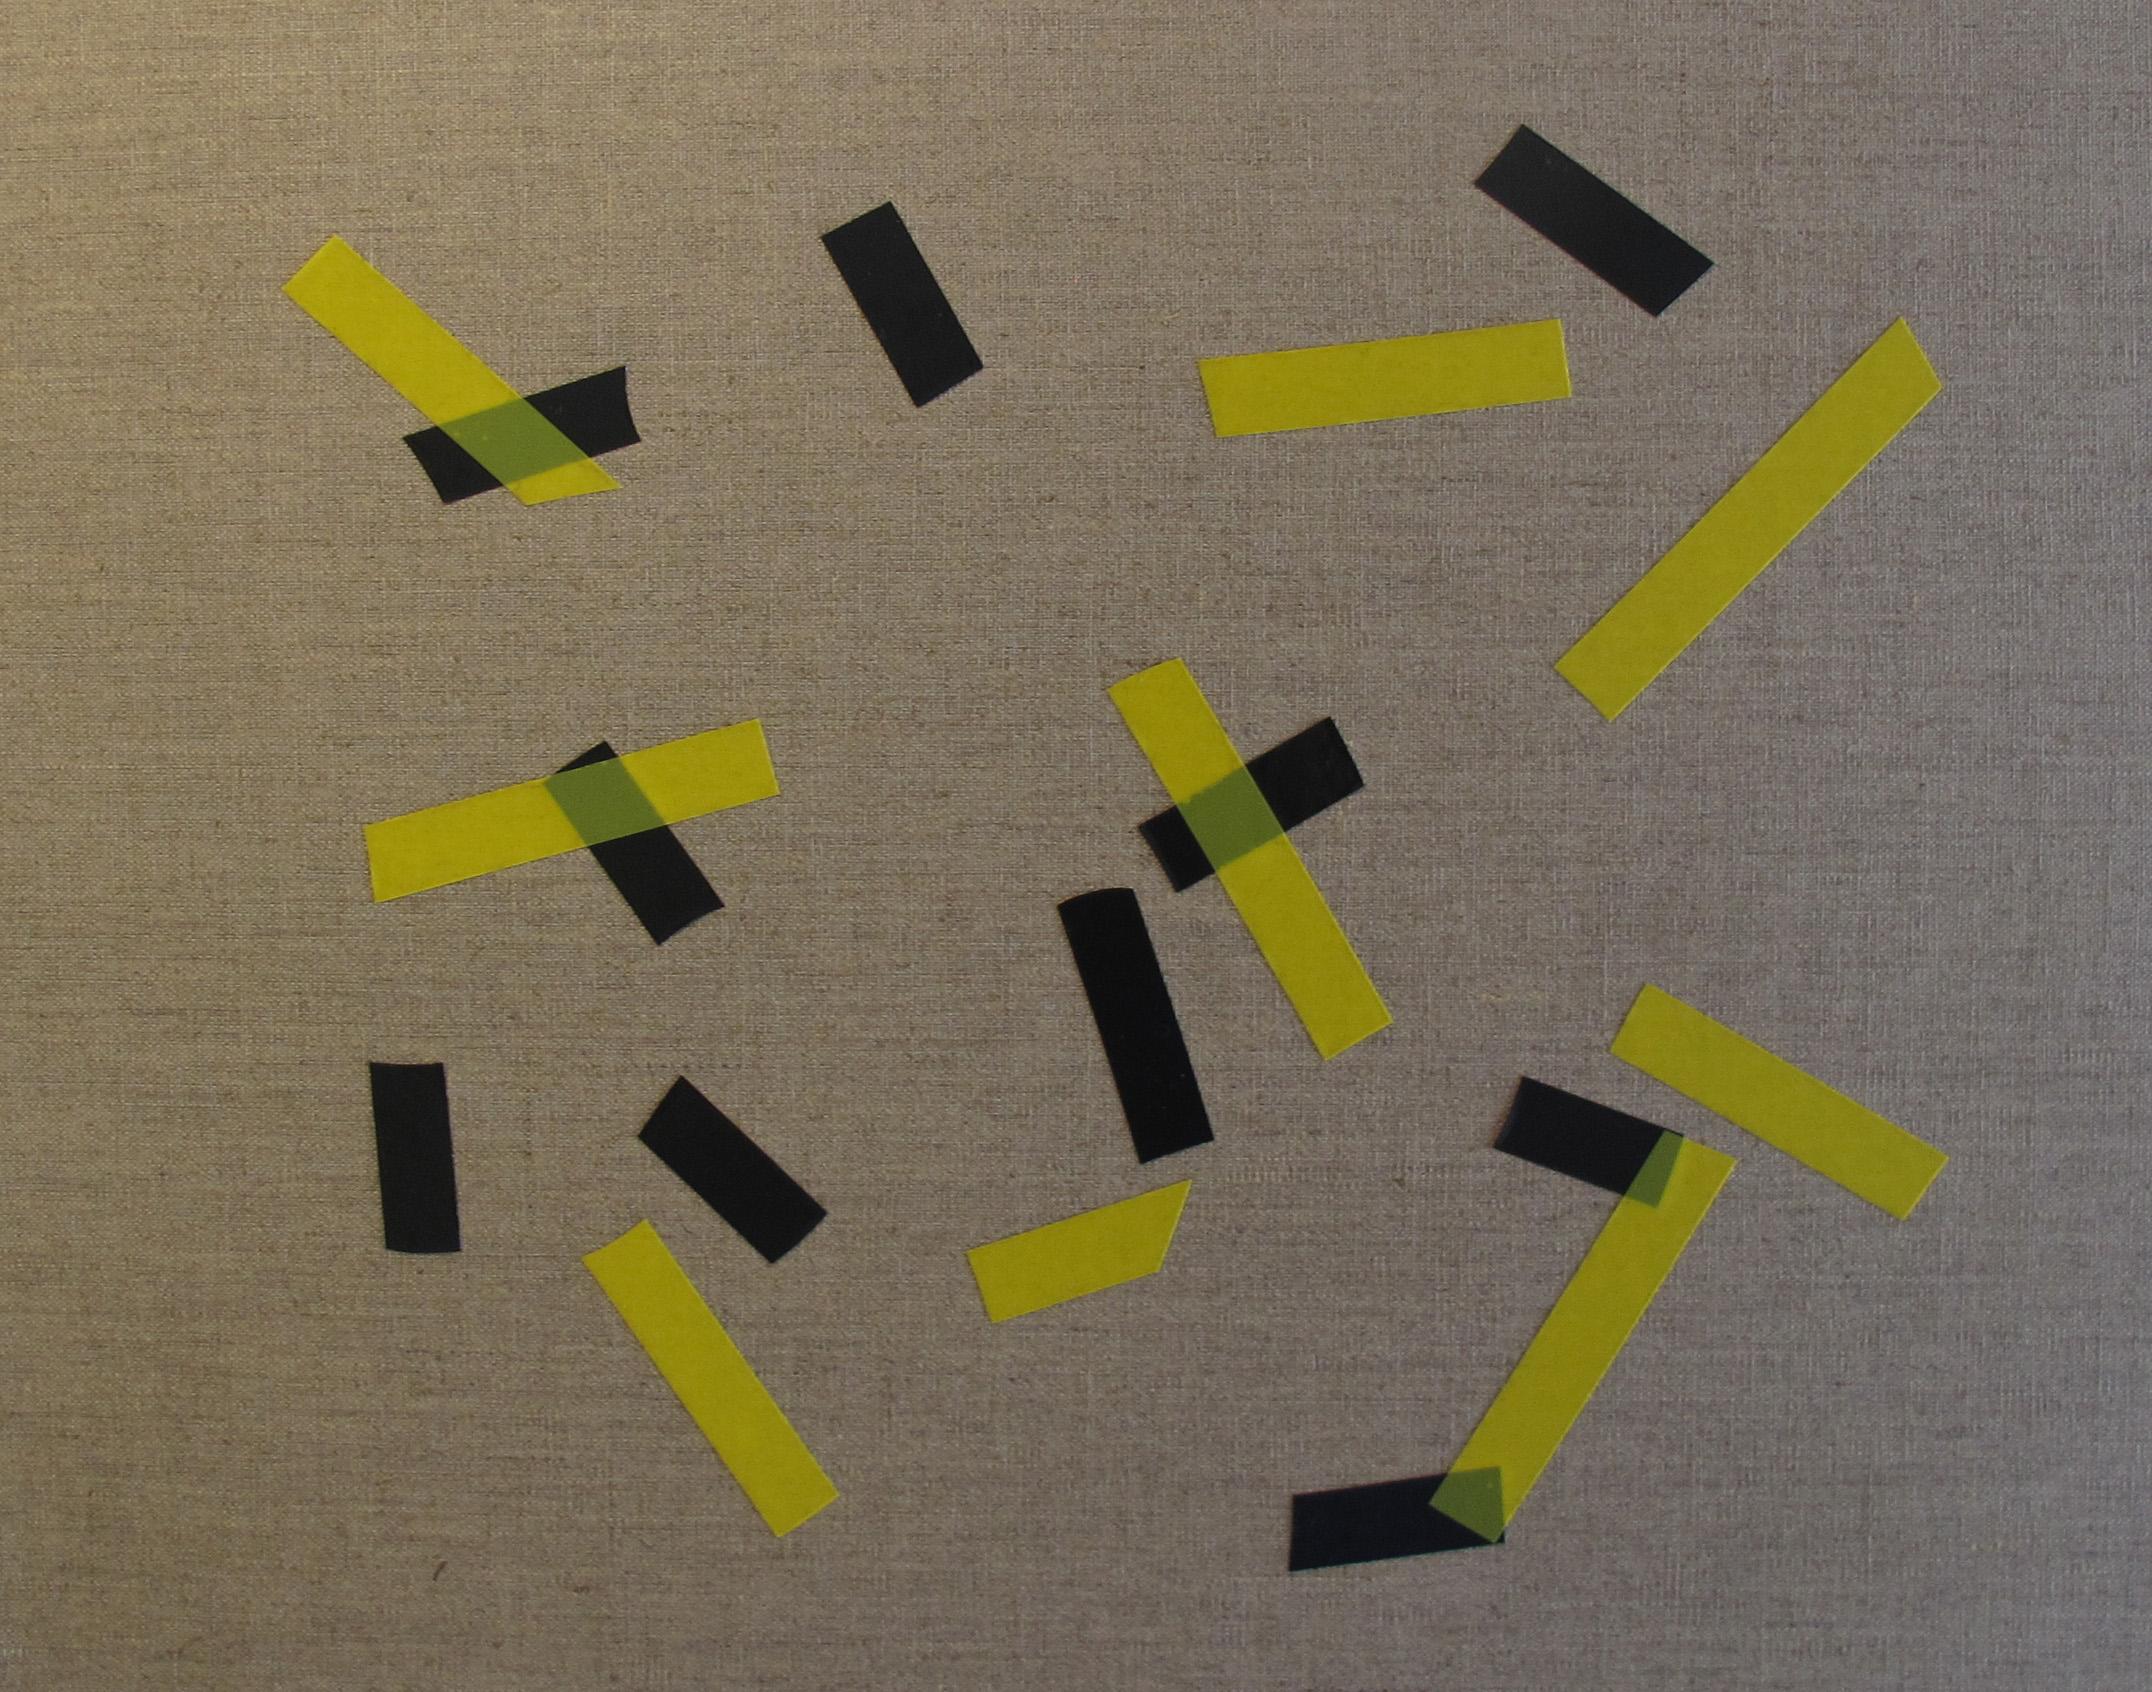 Billy Gruner,  Folk-Tape work No. 4 (Black Yellow),  2012, electrical tape, linen artboard, 40 x 50cm